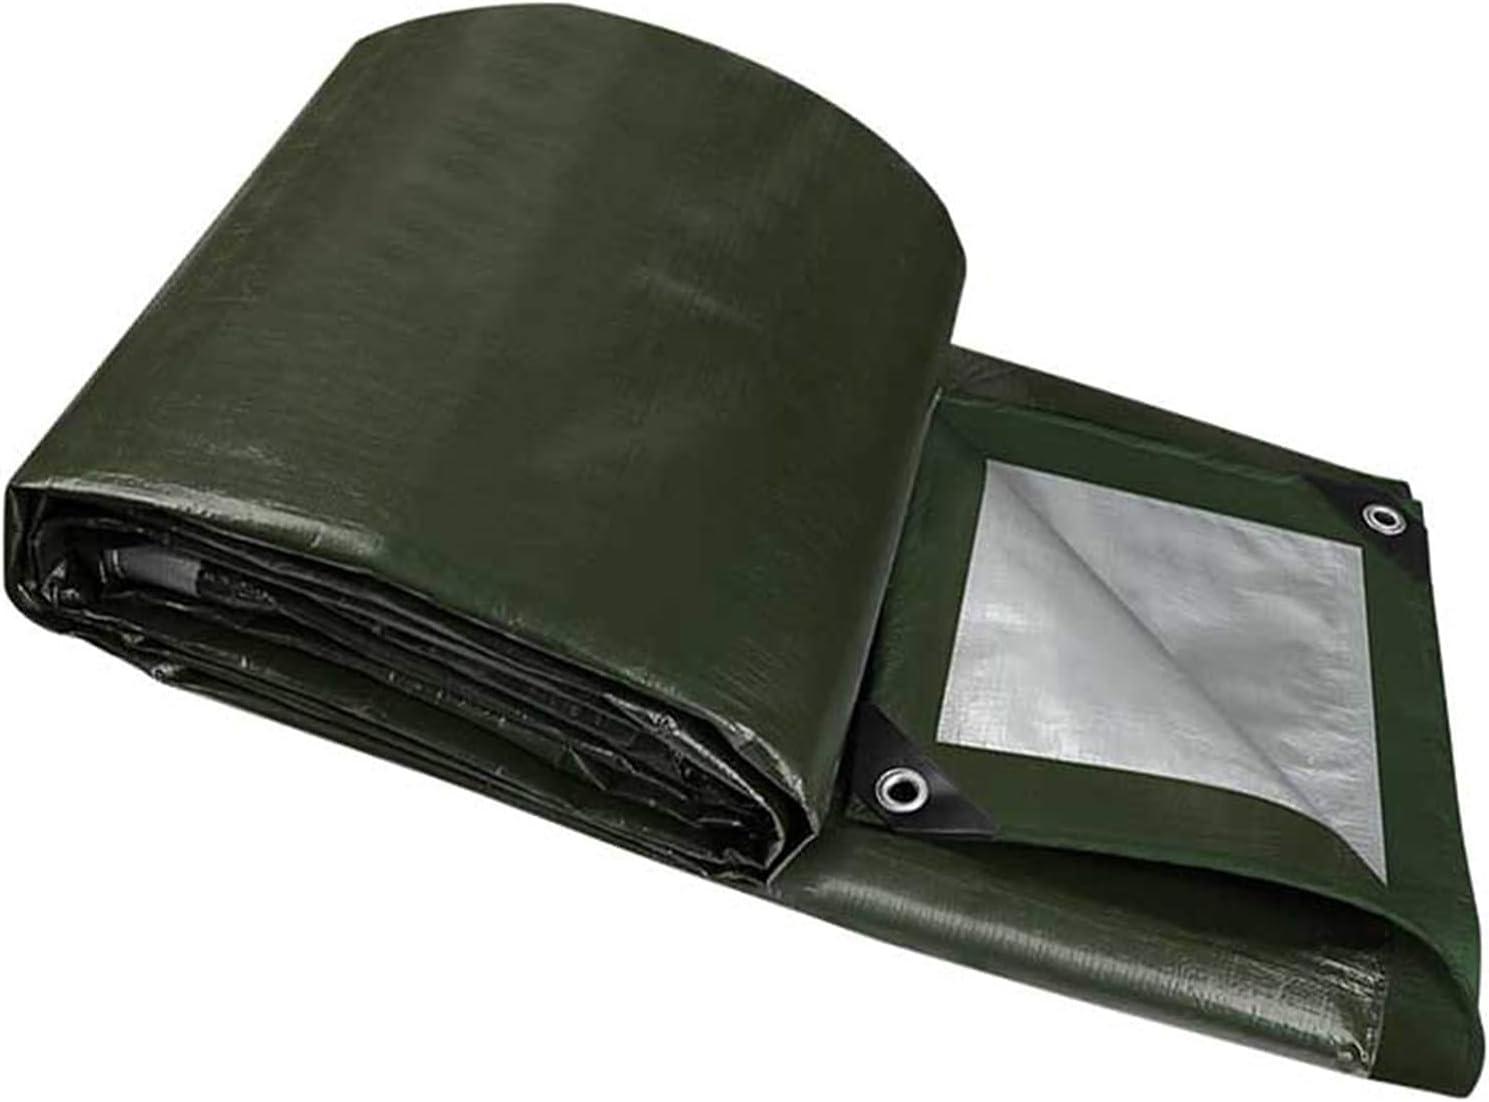 MVNZXL Under blast sales Animer and price revision Tarps Dark Green PE Woven Duty Tarp Tarpaulin Heavy with